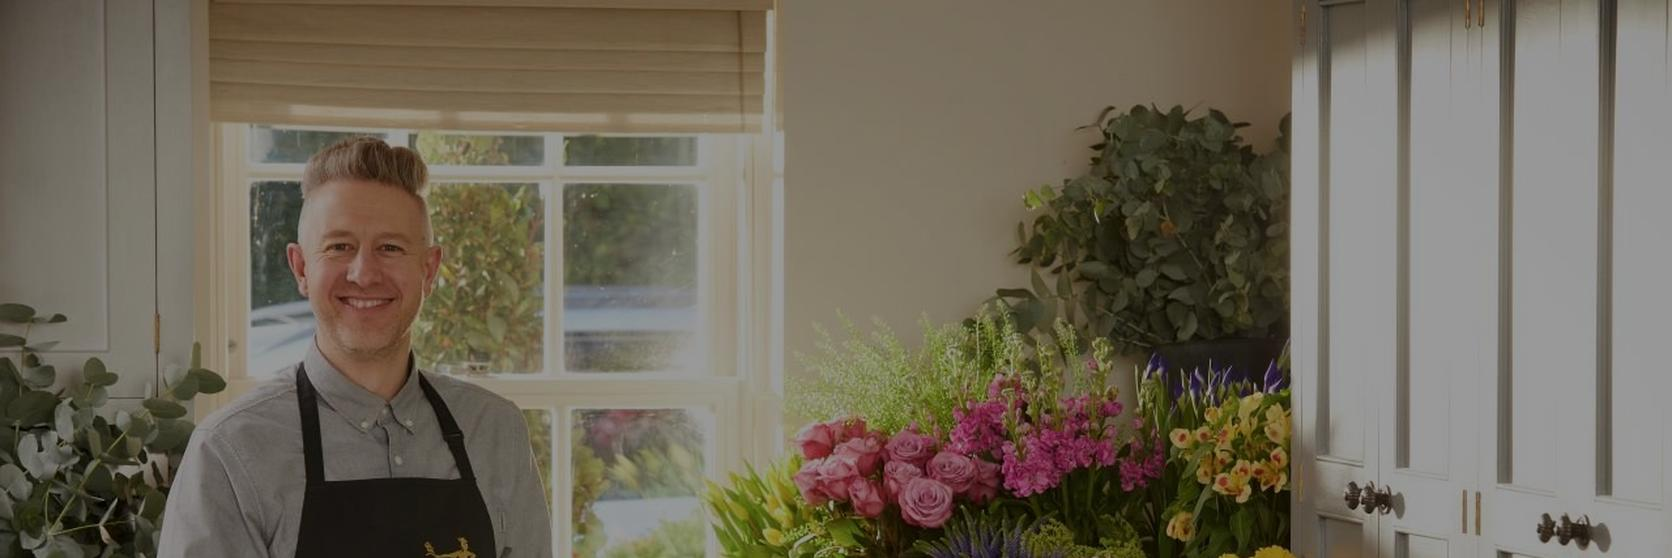 Florist-focus-spring-flowers-1